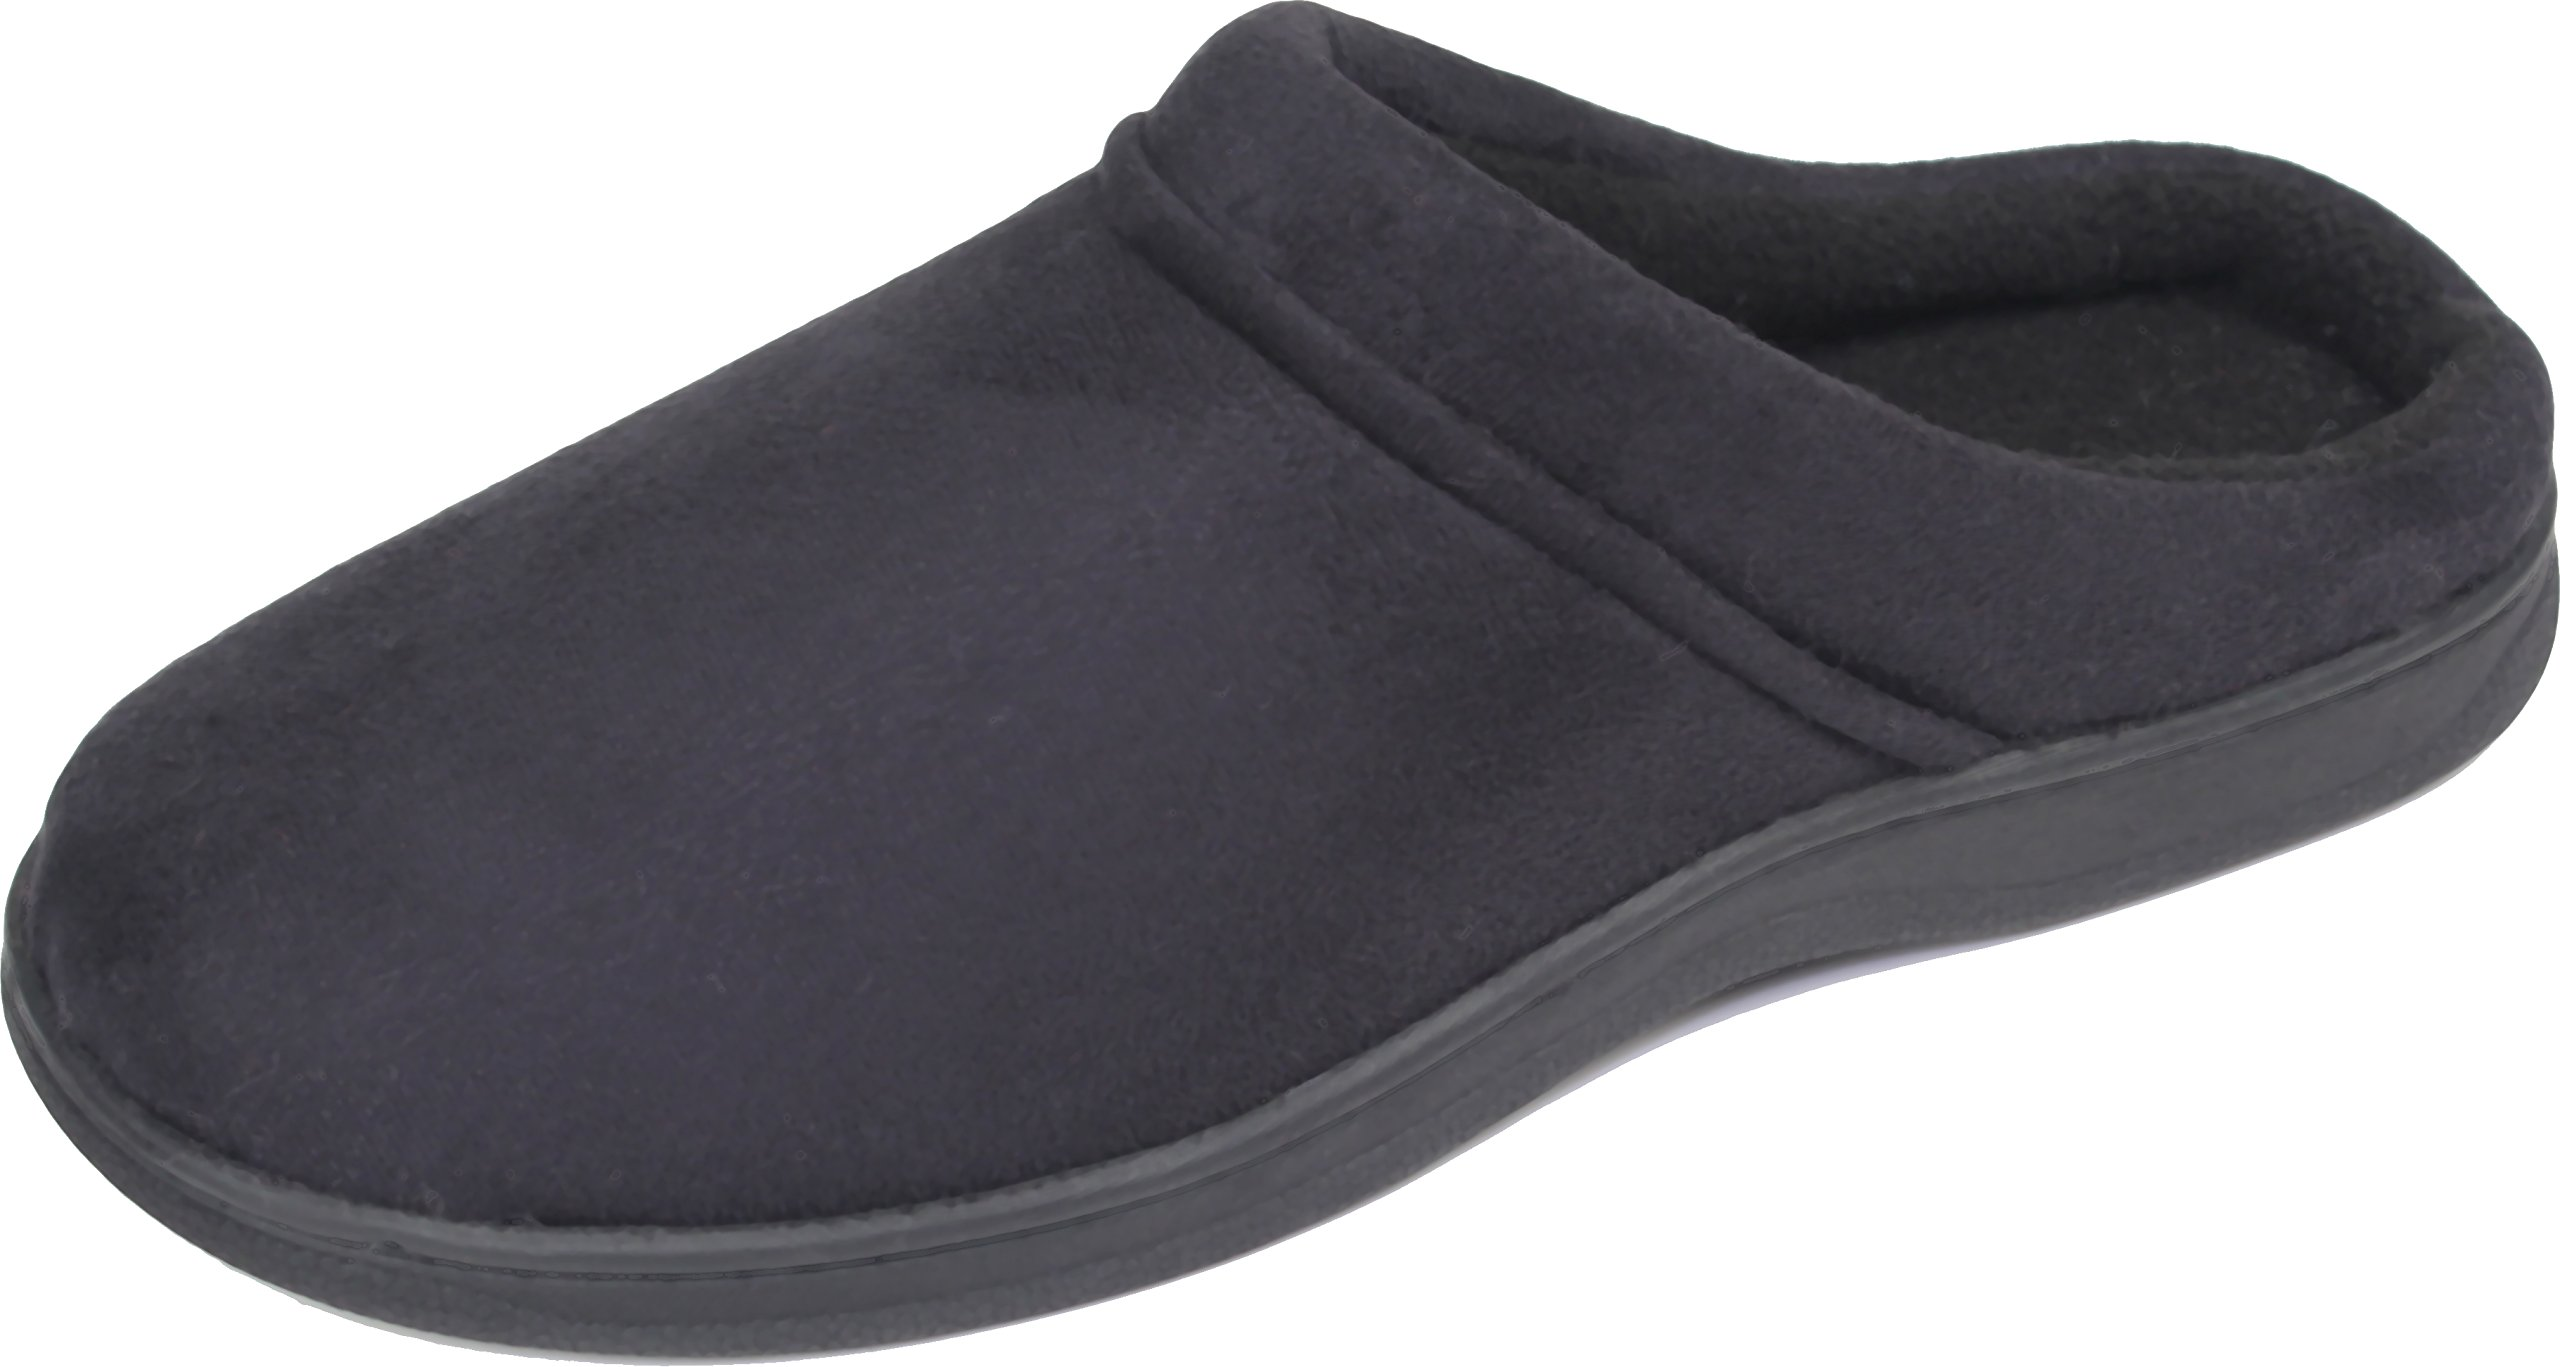 LUXEHOME Men's Slip On Indoor/Outdoor Fleece Scuffs Slipper (10-11 US, Dark Blue)